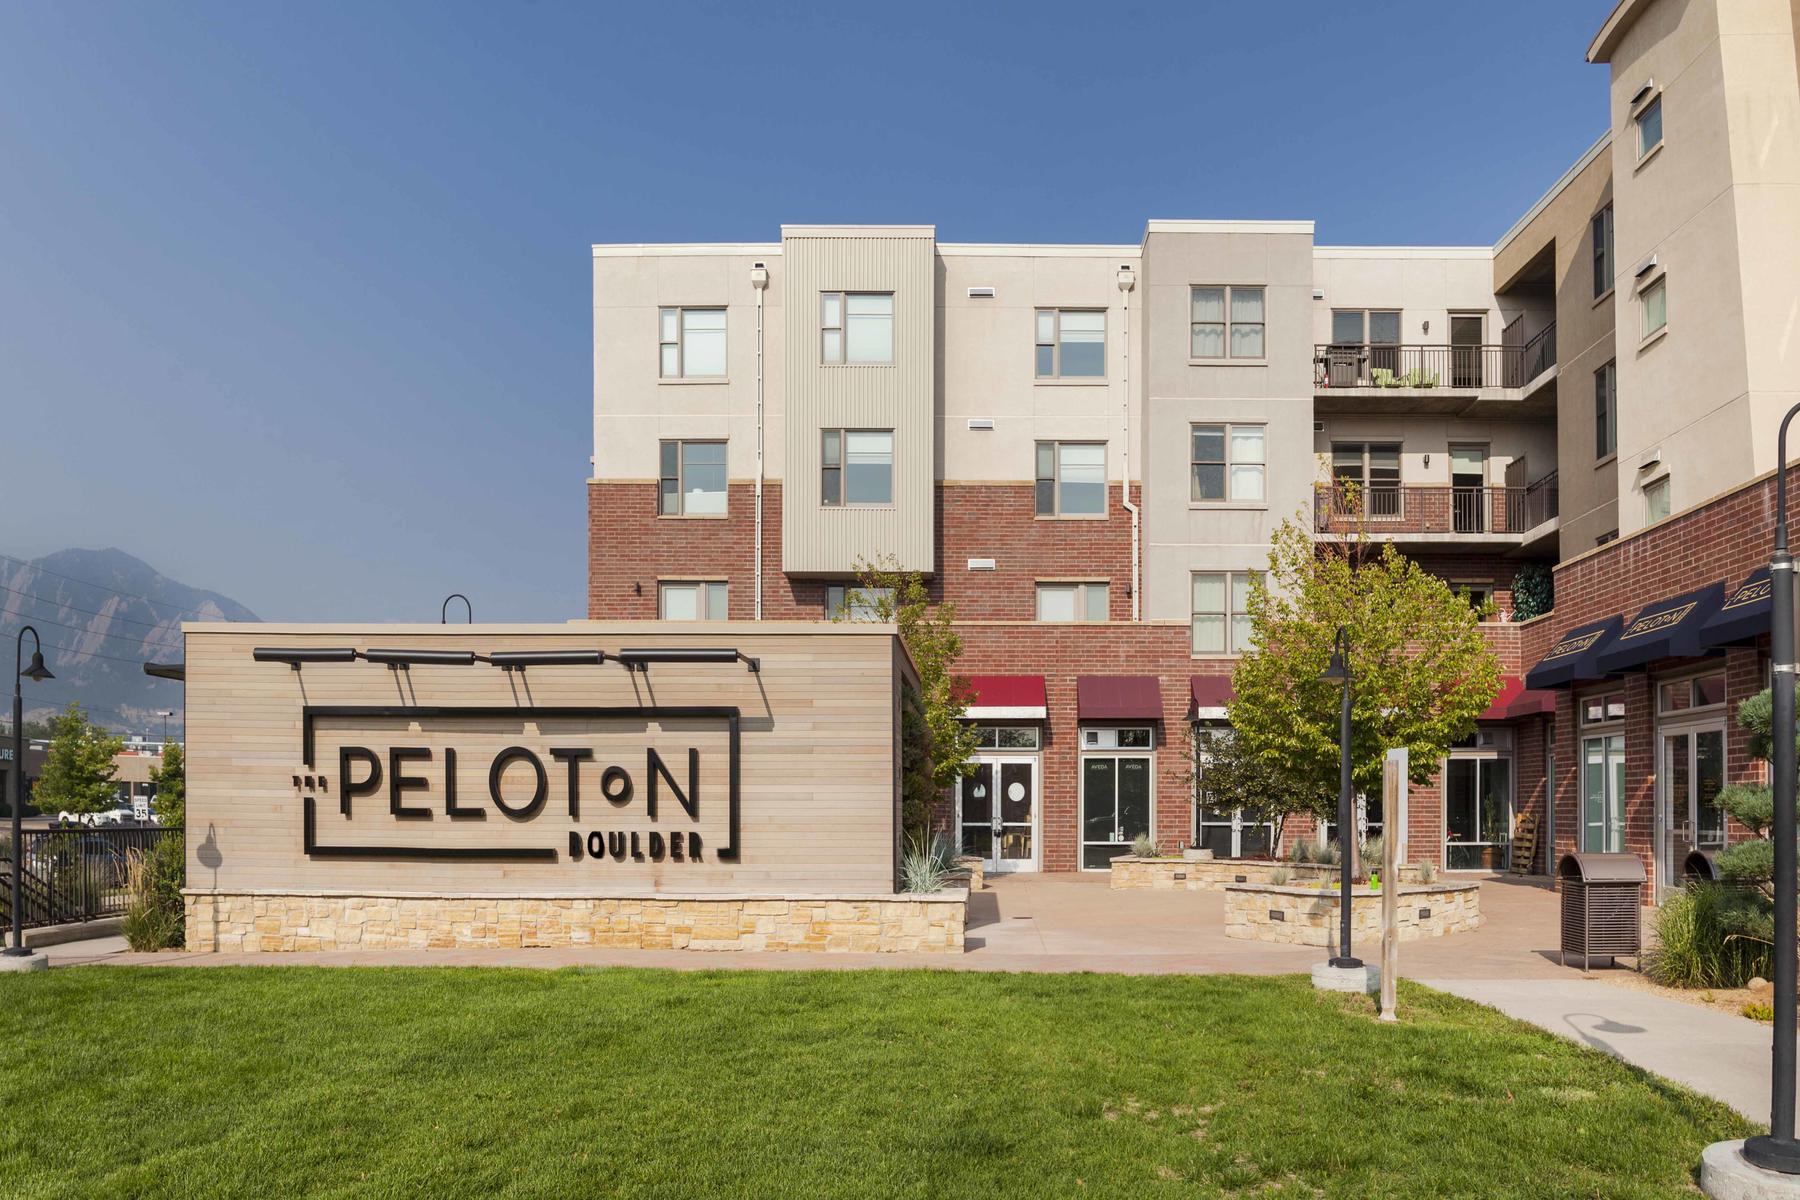 Condominium for Active at Modern Loft Peloton Condo 3601 Arapahoe Ave 221 Boulder, Colorado 80303 United States